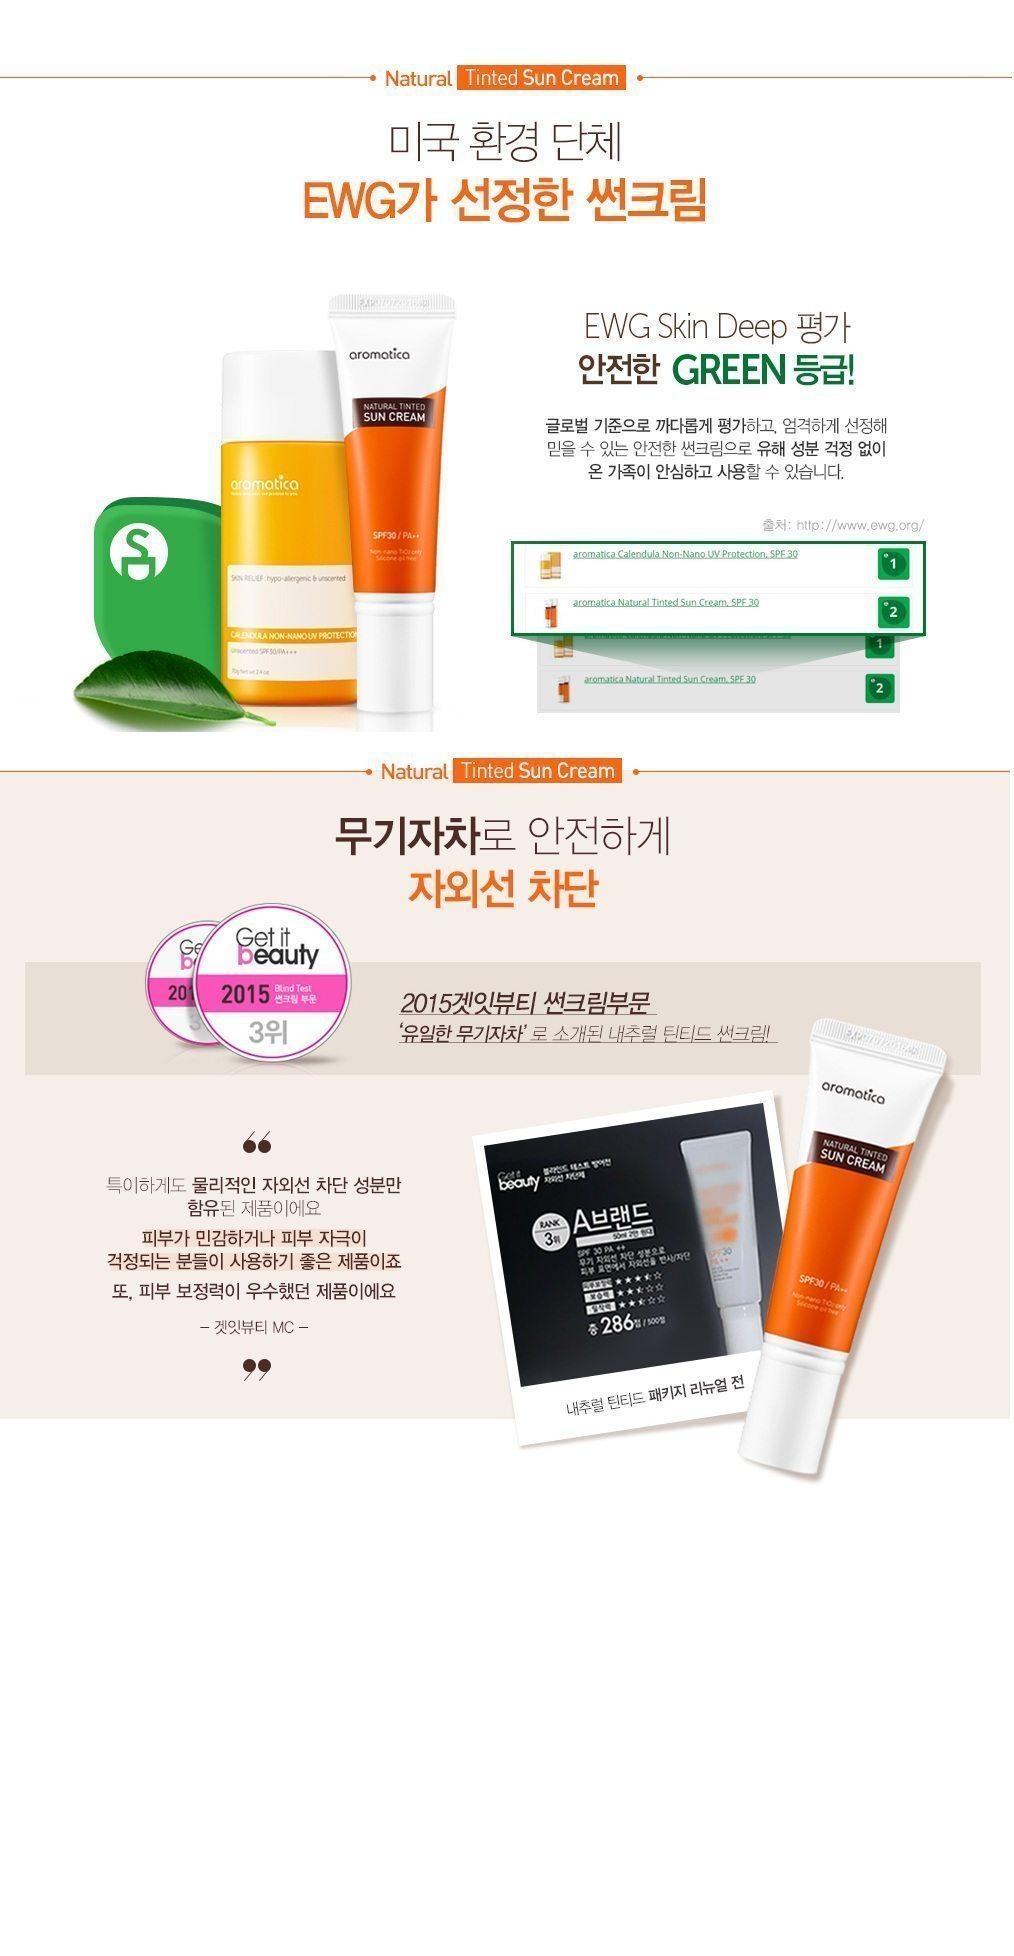 Aromatica Natural Tinted Sun Cream korean cosmetic skincare product online shop malaysia china japan2